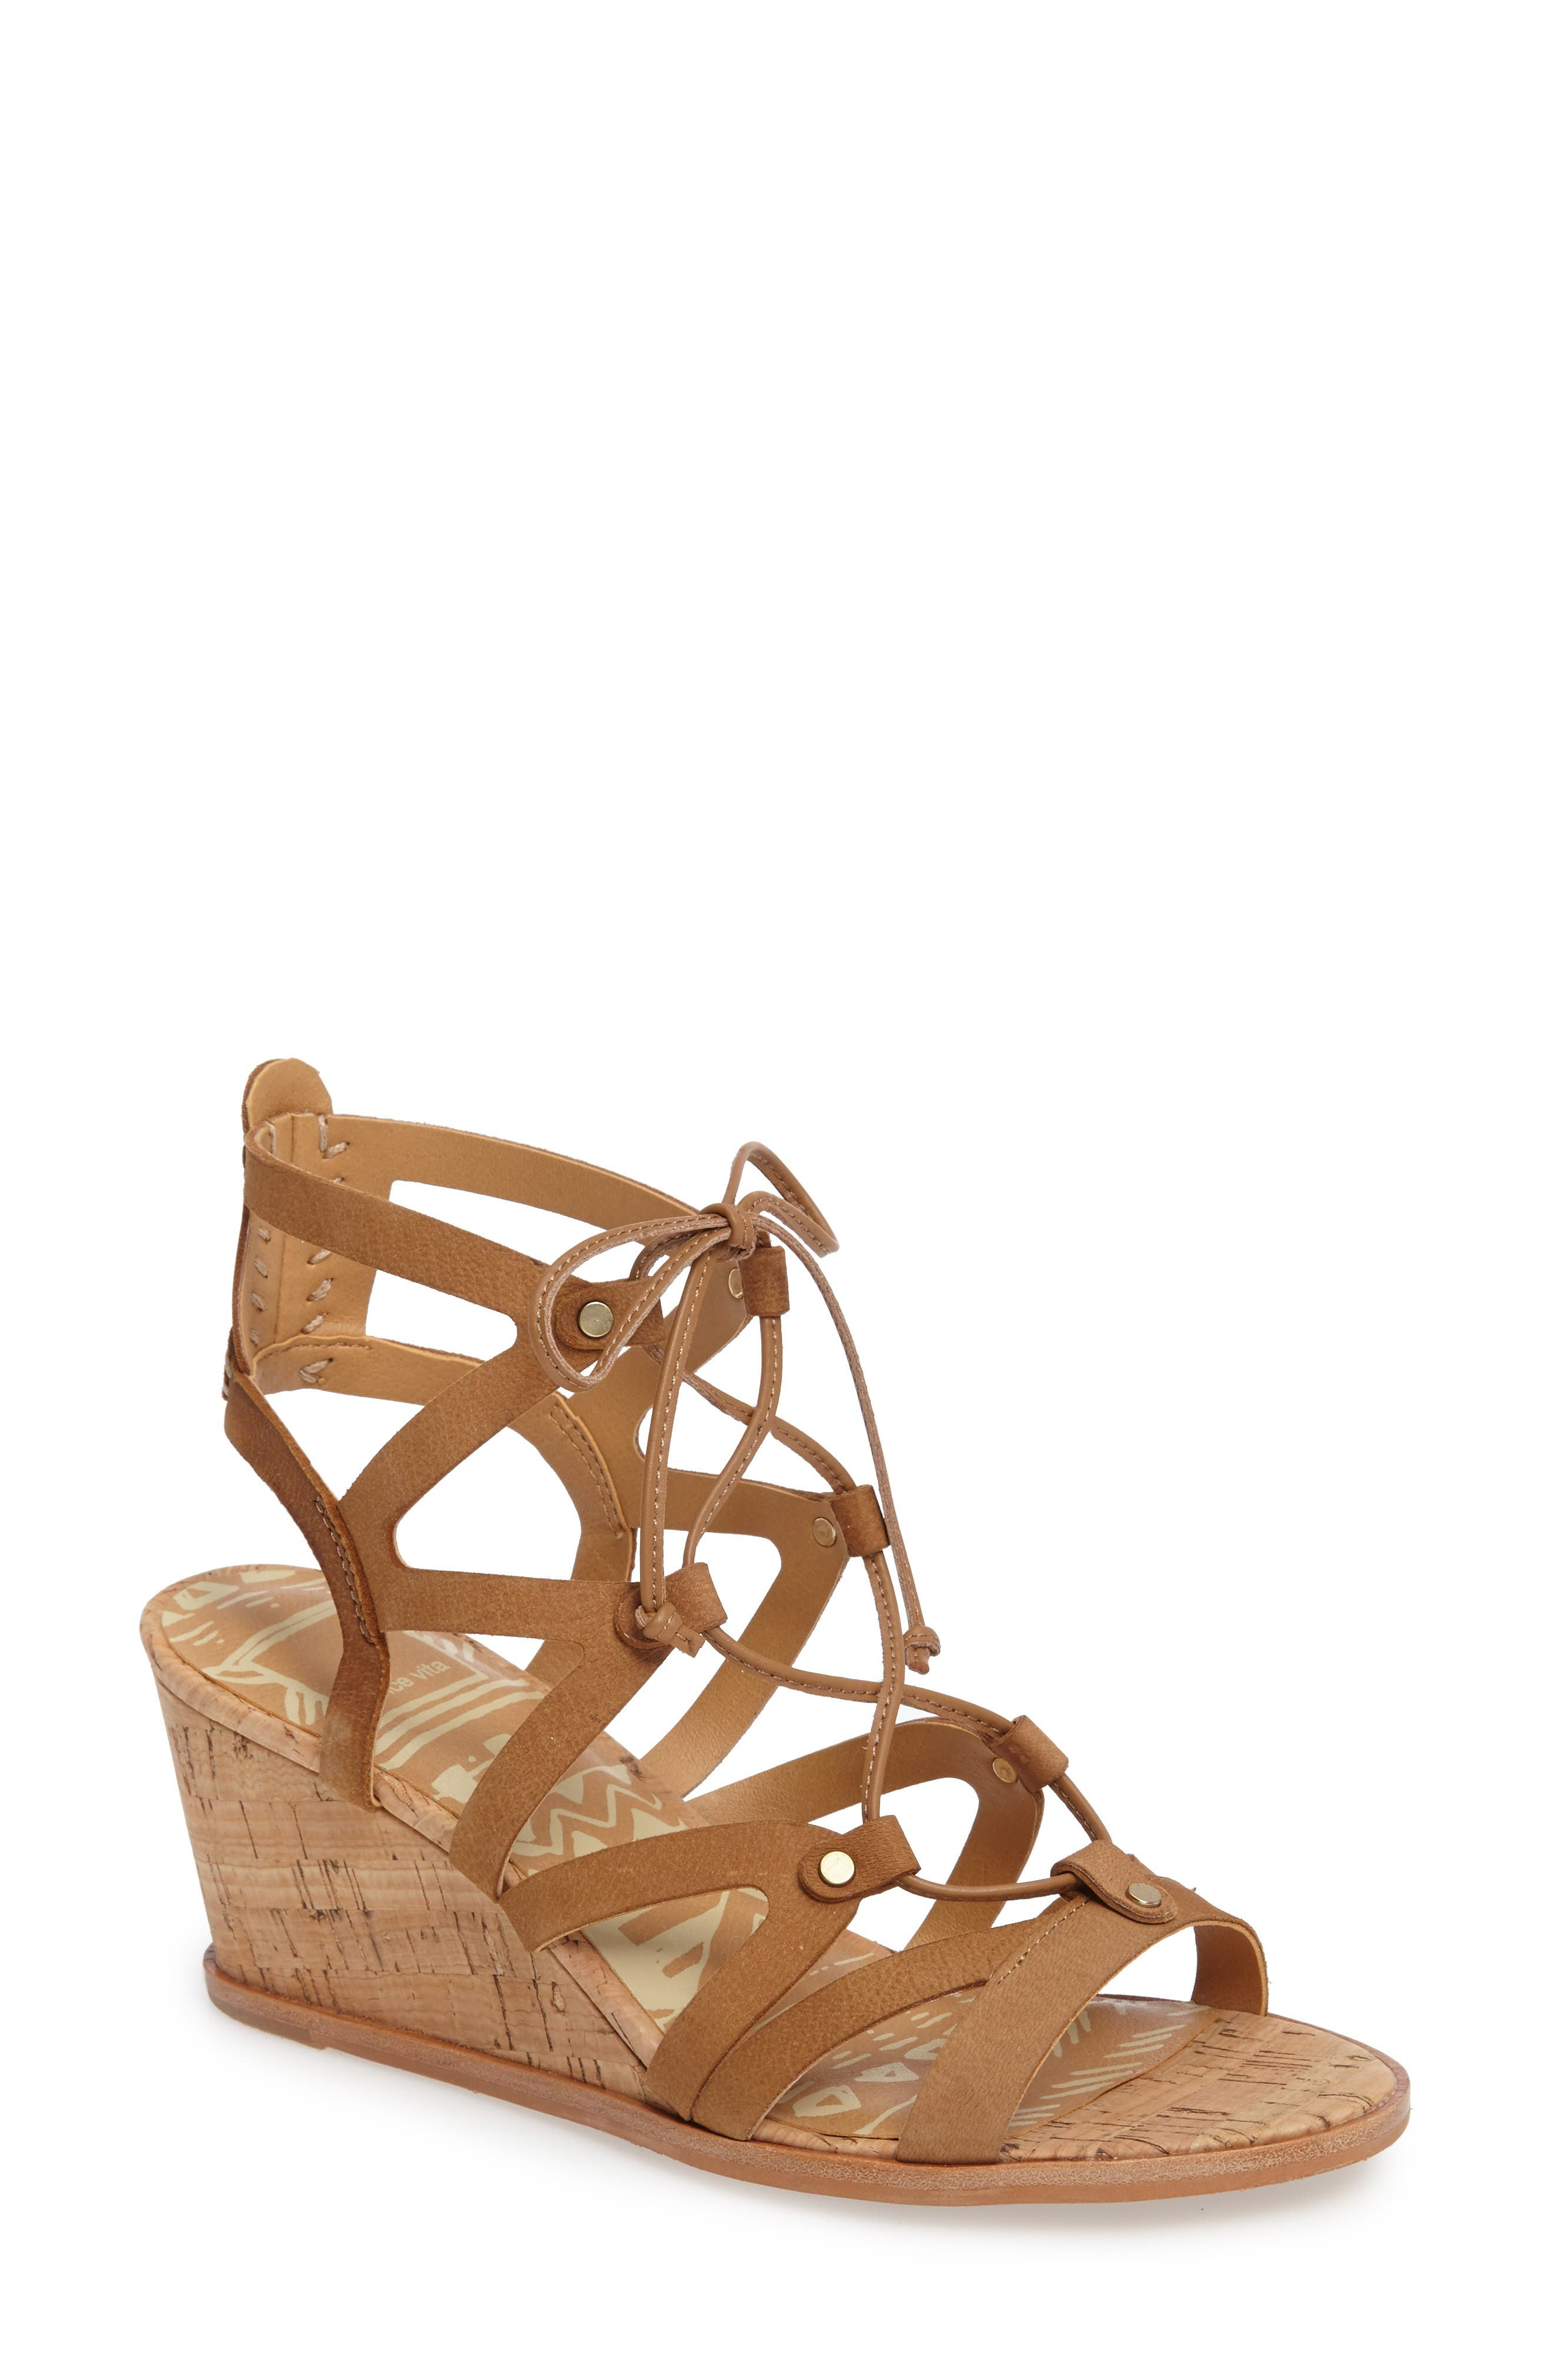 Main Image - Dolce Vita Lynnie Wedge Sandal (Women)